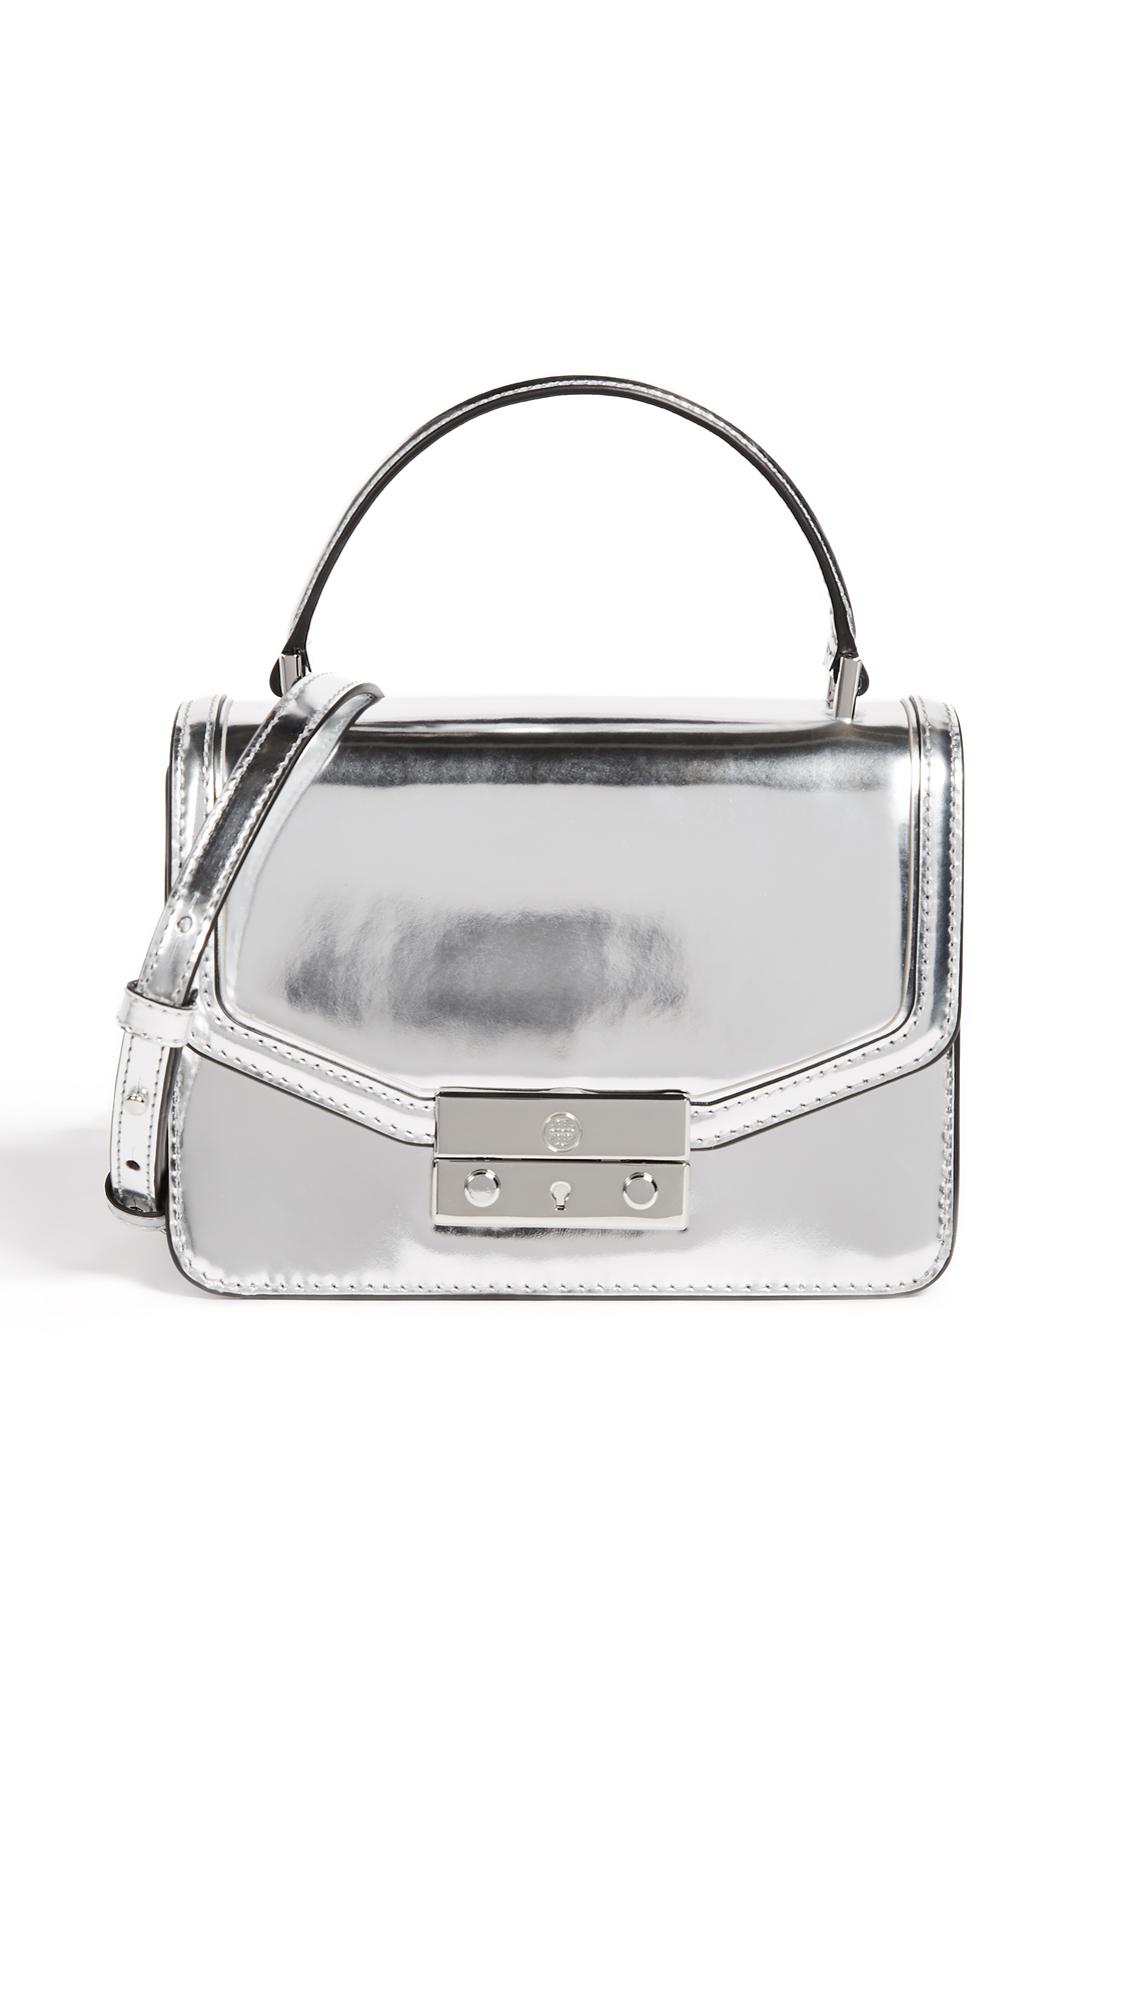 Tory Burch Juliette Metallic Mini Top Handle Satchel - Silver